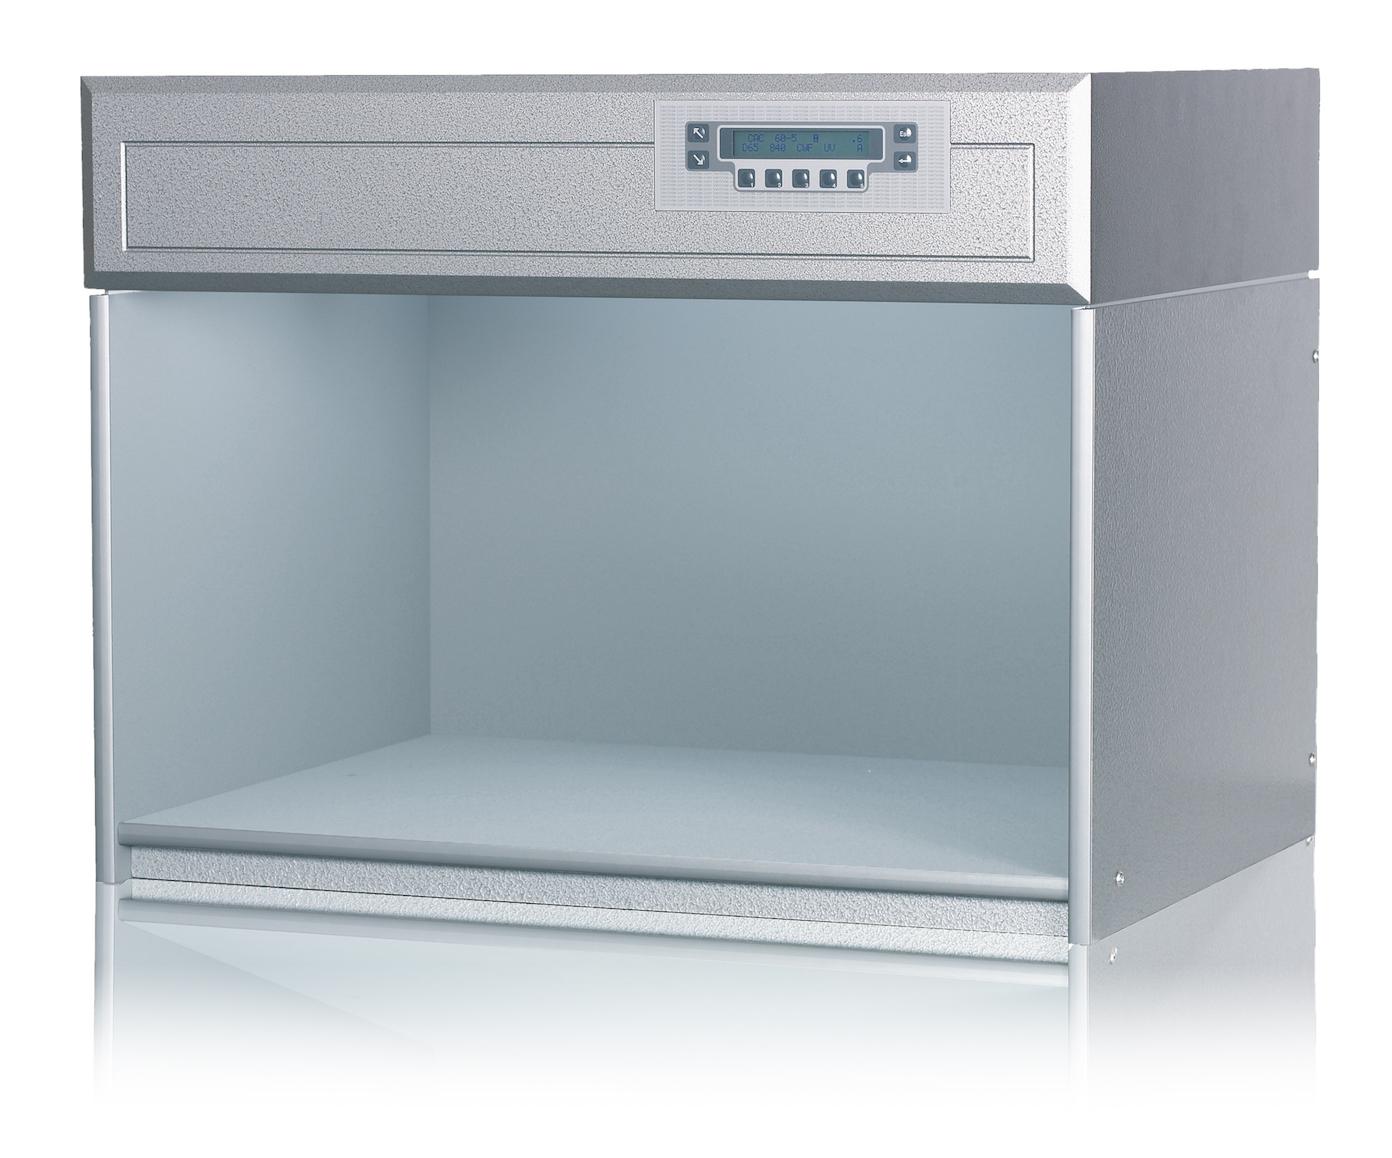 Light cabinets